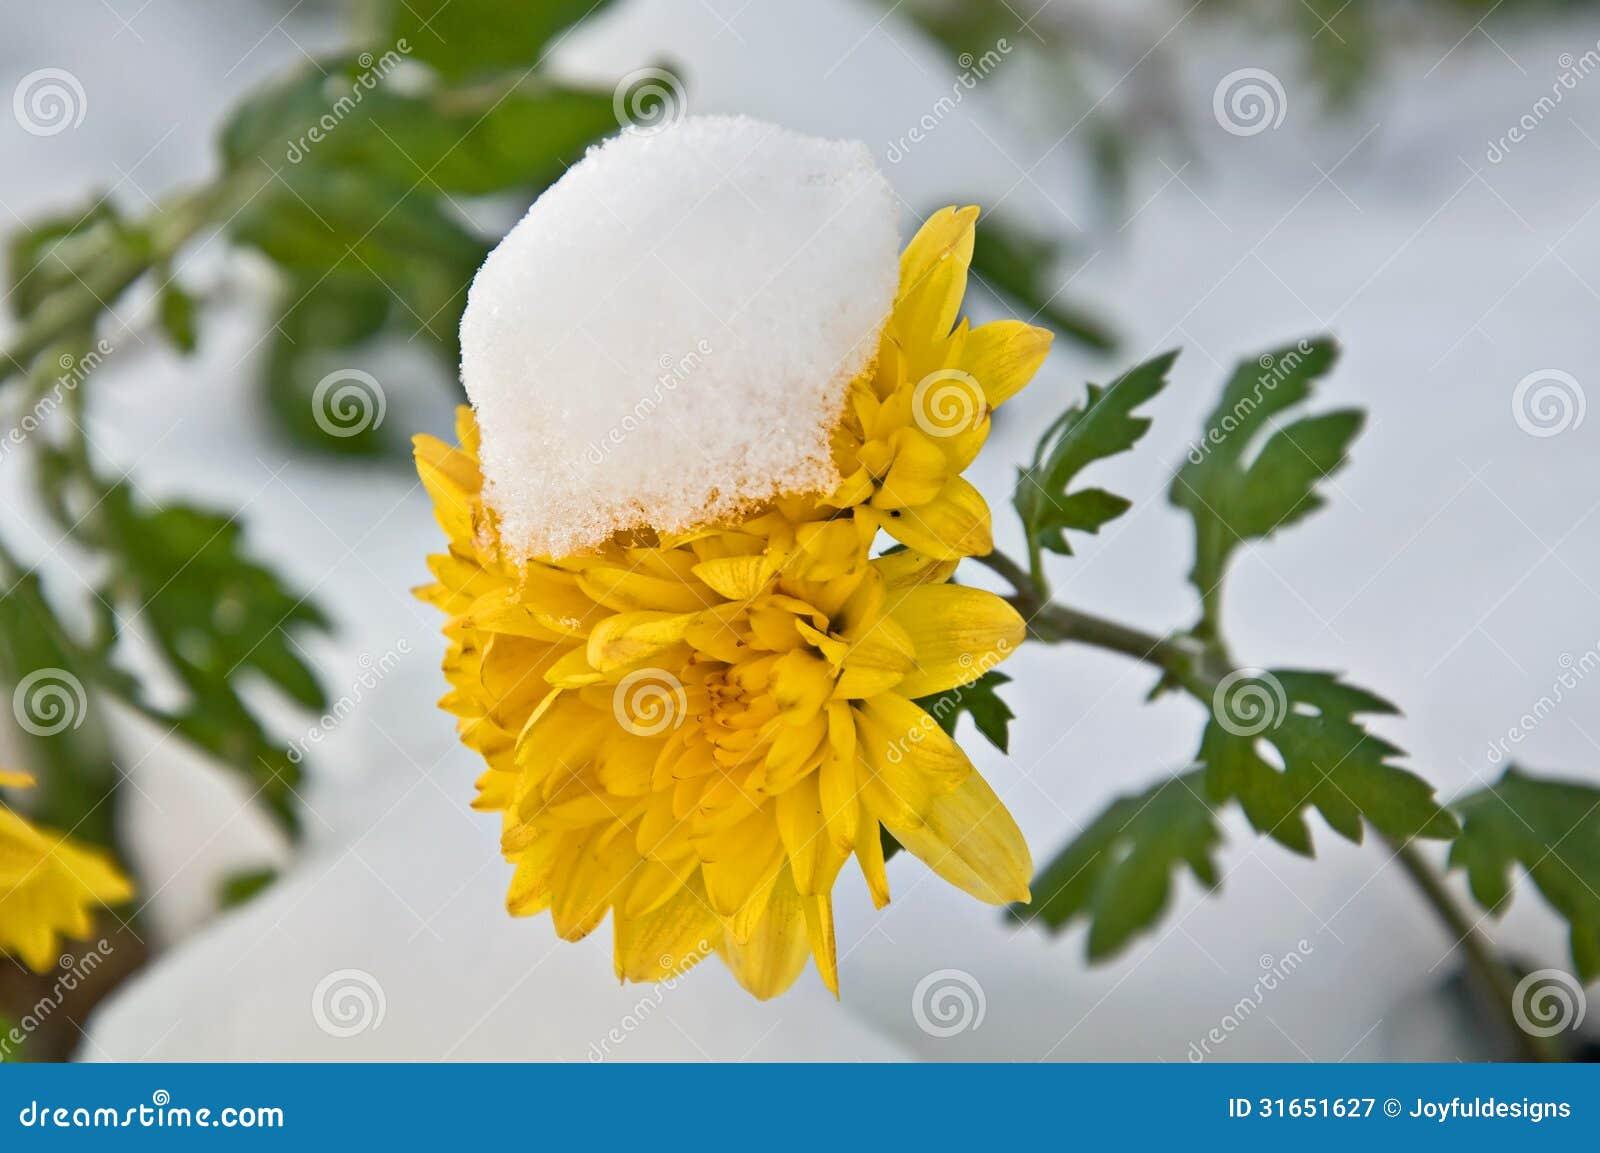 Newly Fallen Snow On Yellow Mum Flower Stock Image Image Of Nobody